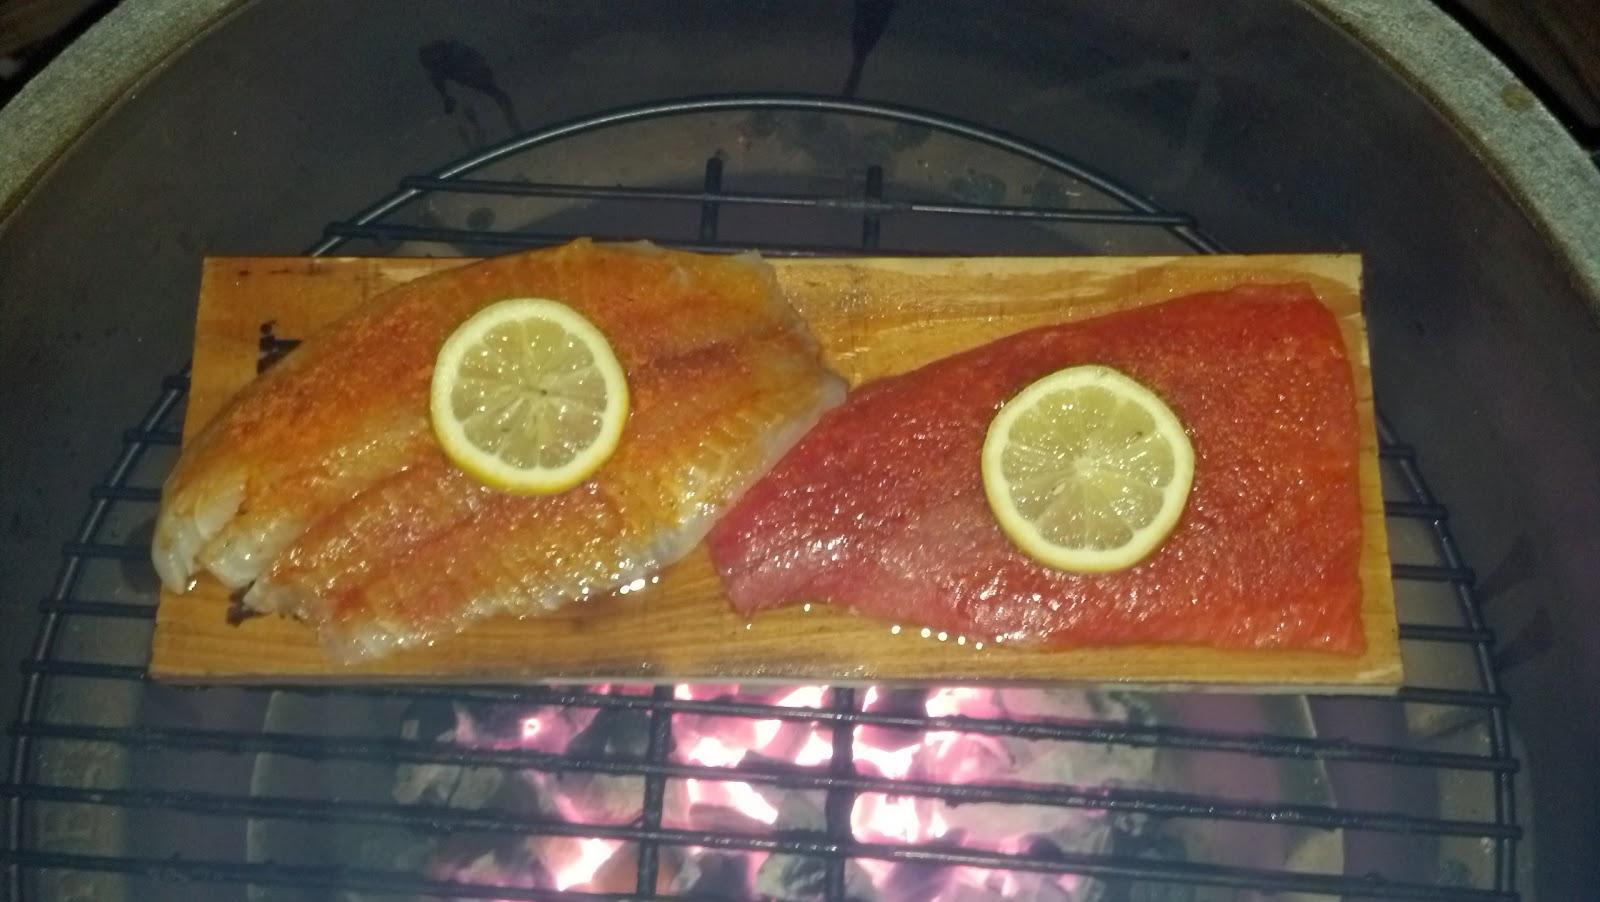 Chris big green egg adventure cedar plank salmon tilapia cedar plank salmon tilapia ccuart Image collections